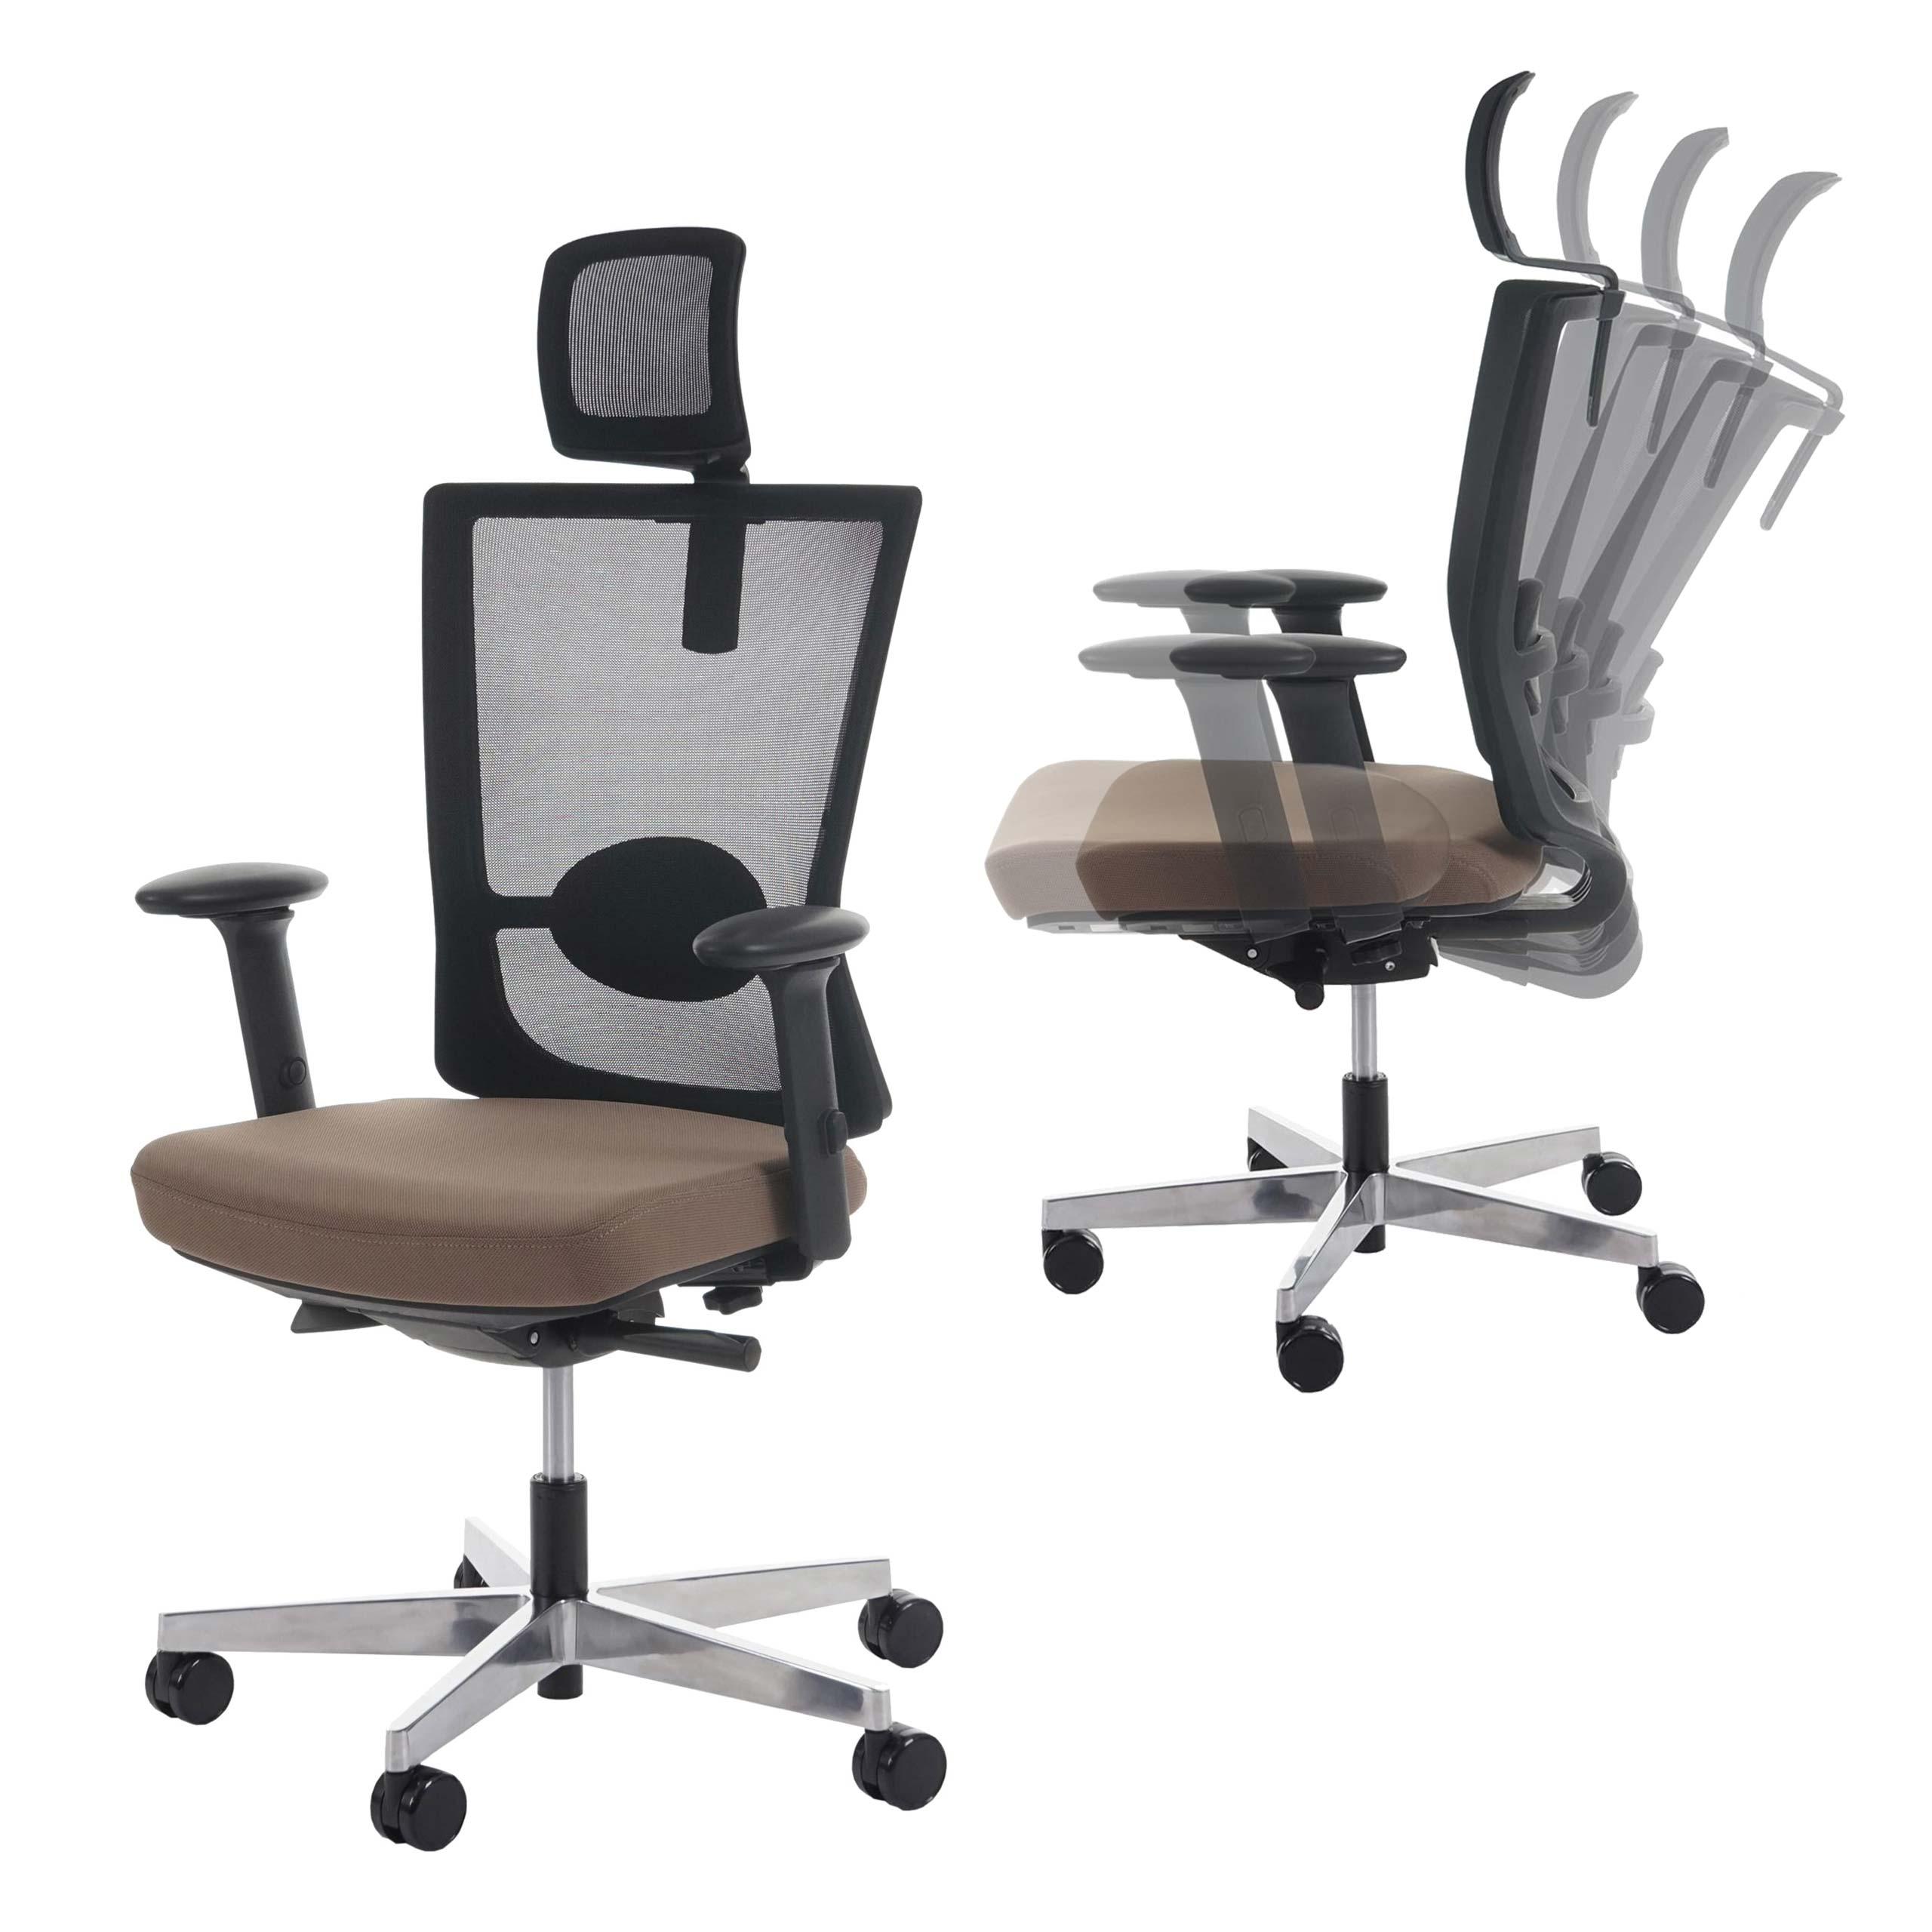 Bürostuhl Wippmechanik bürostuhl belfast schreibtischstuhl drehstuhl ergonomisch taupe